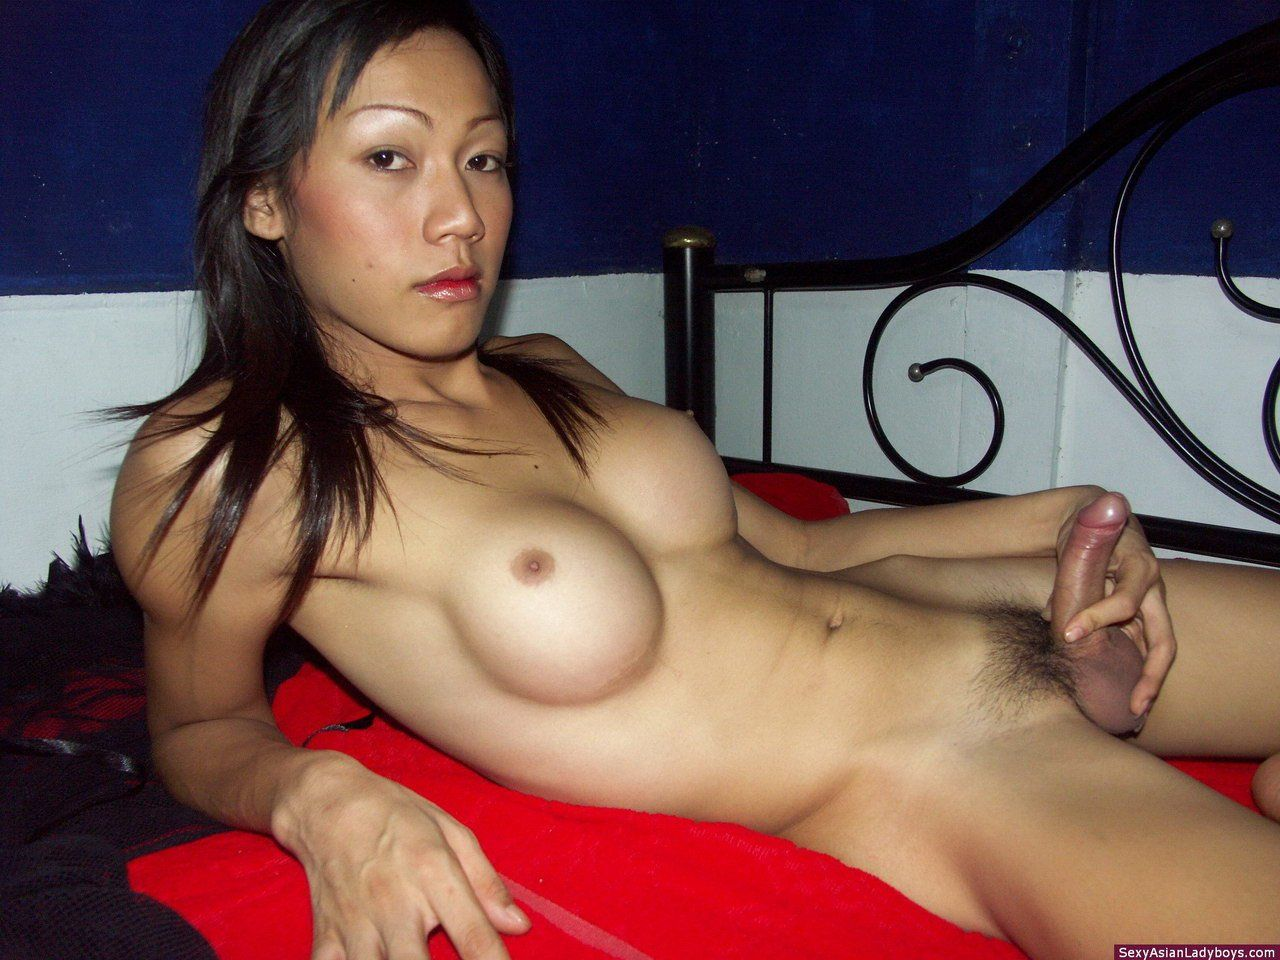 Asian Lady Boy Copilation Porn asian ladyboy nancee - adult best compilations website.